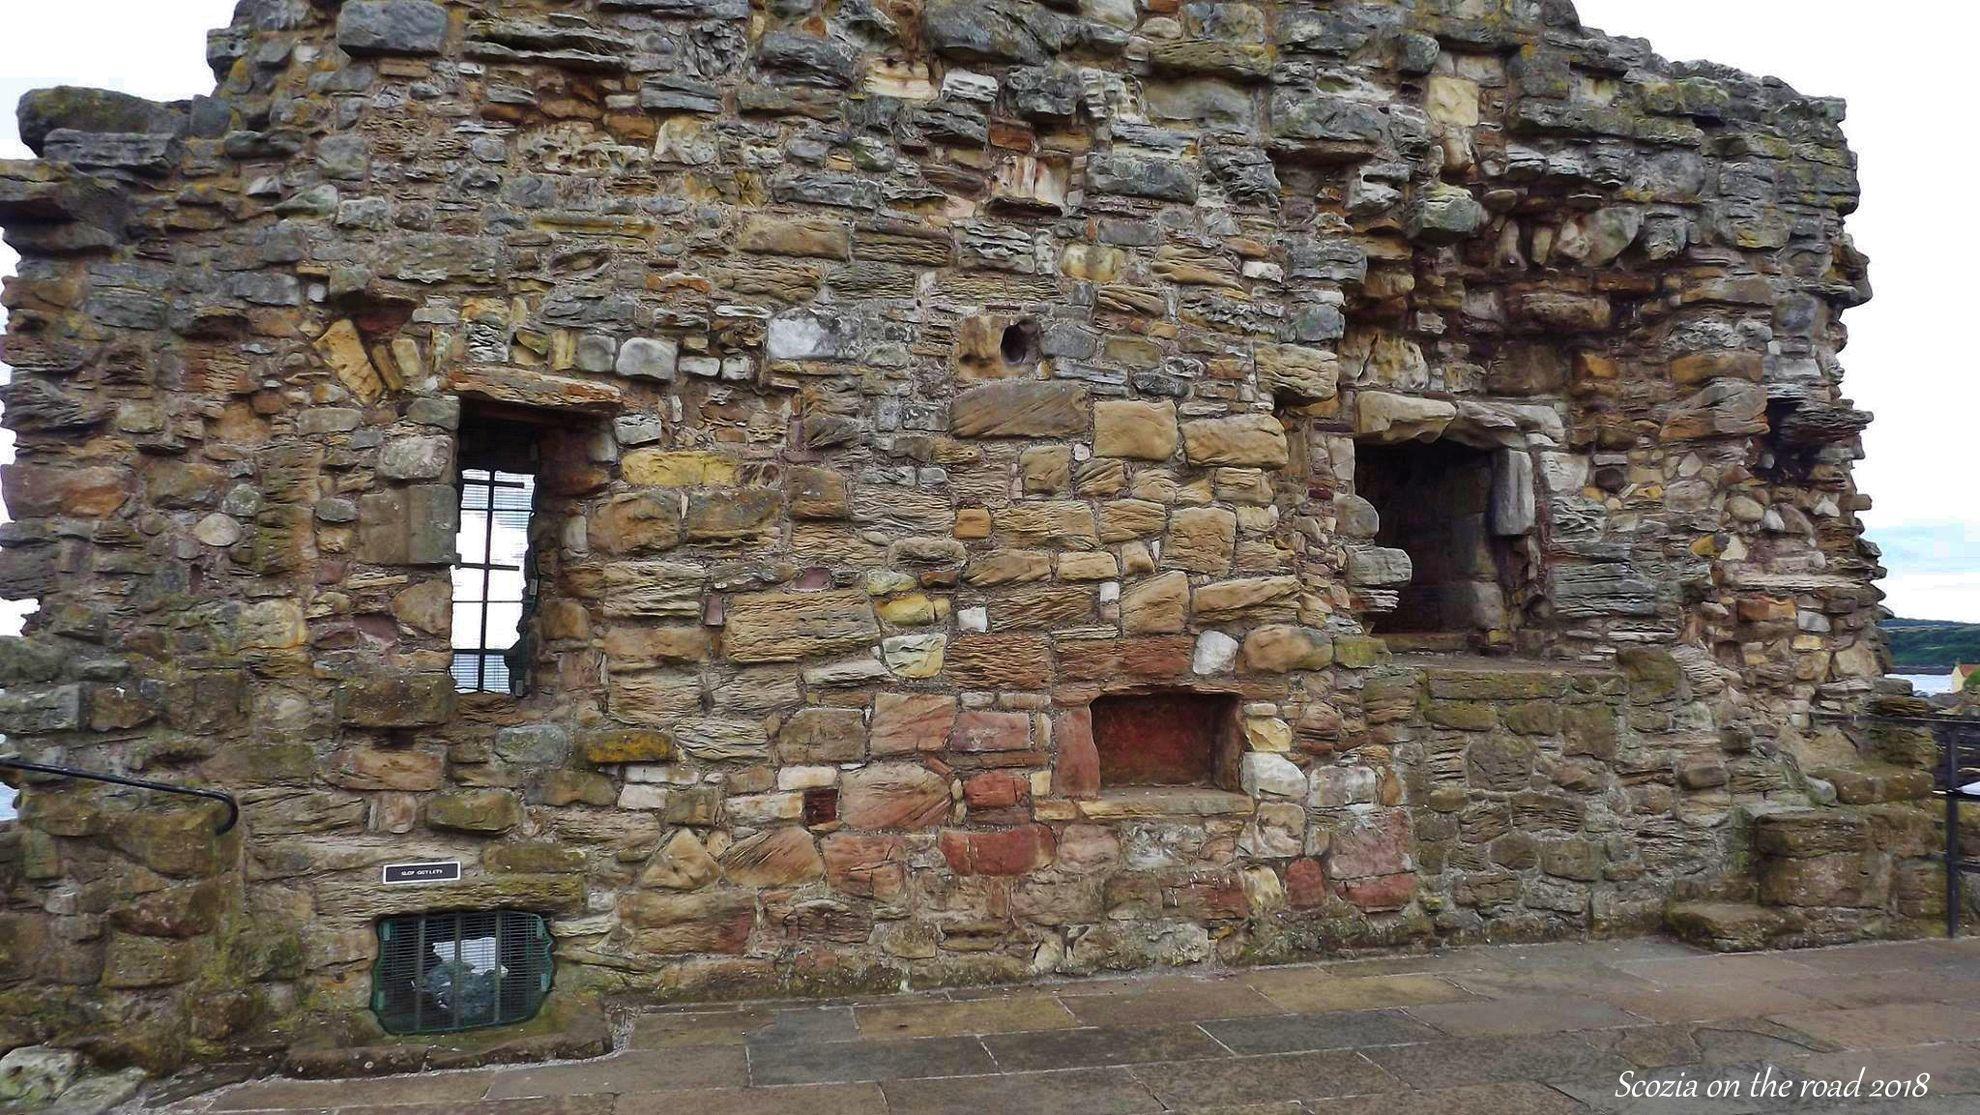 castello di saint andrews - castelli in scozia